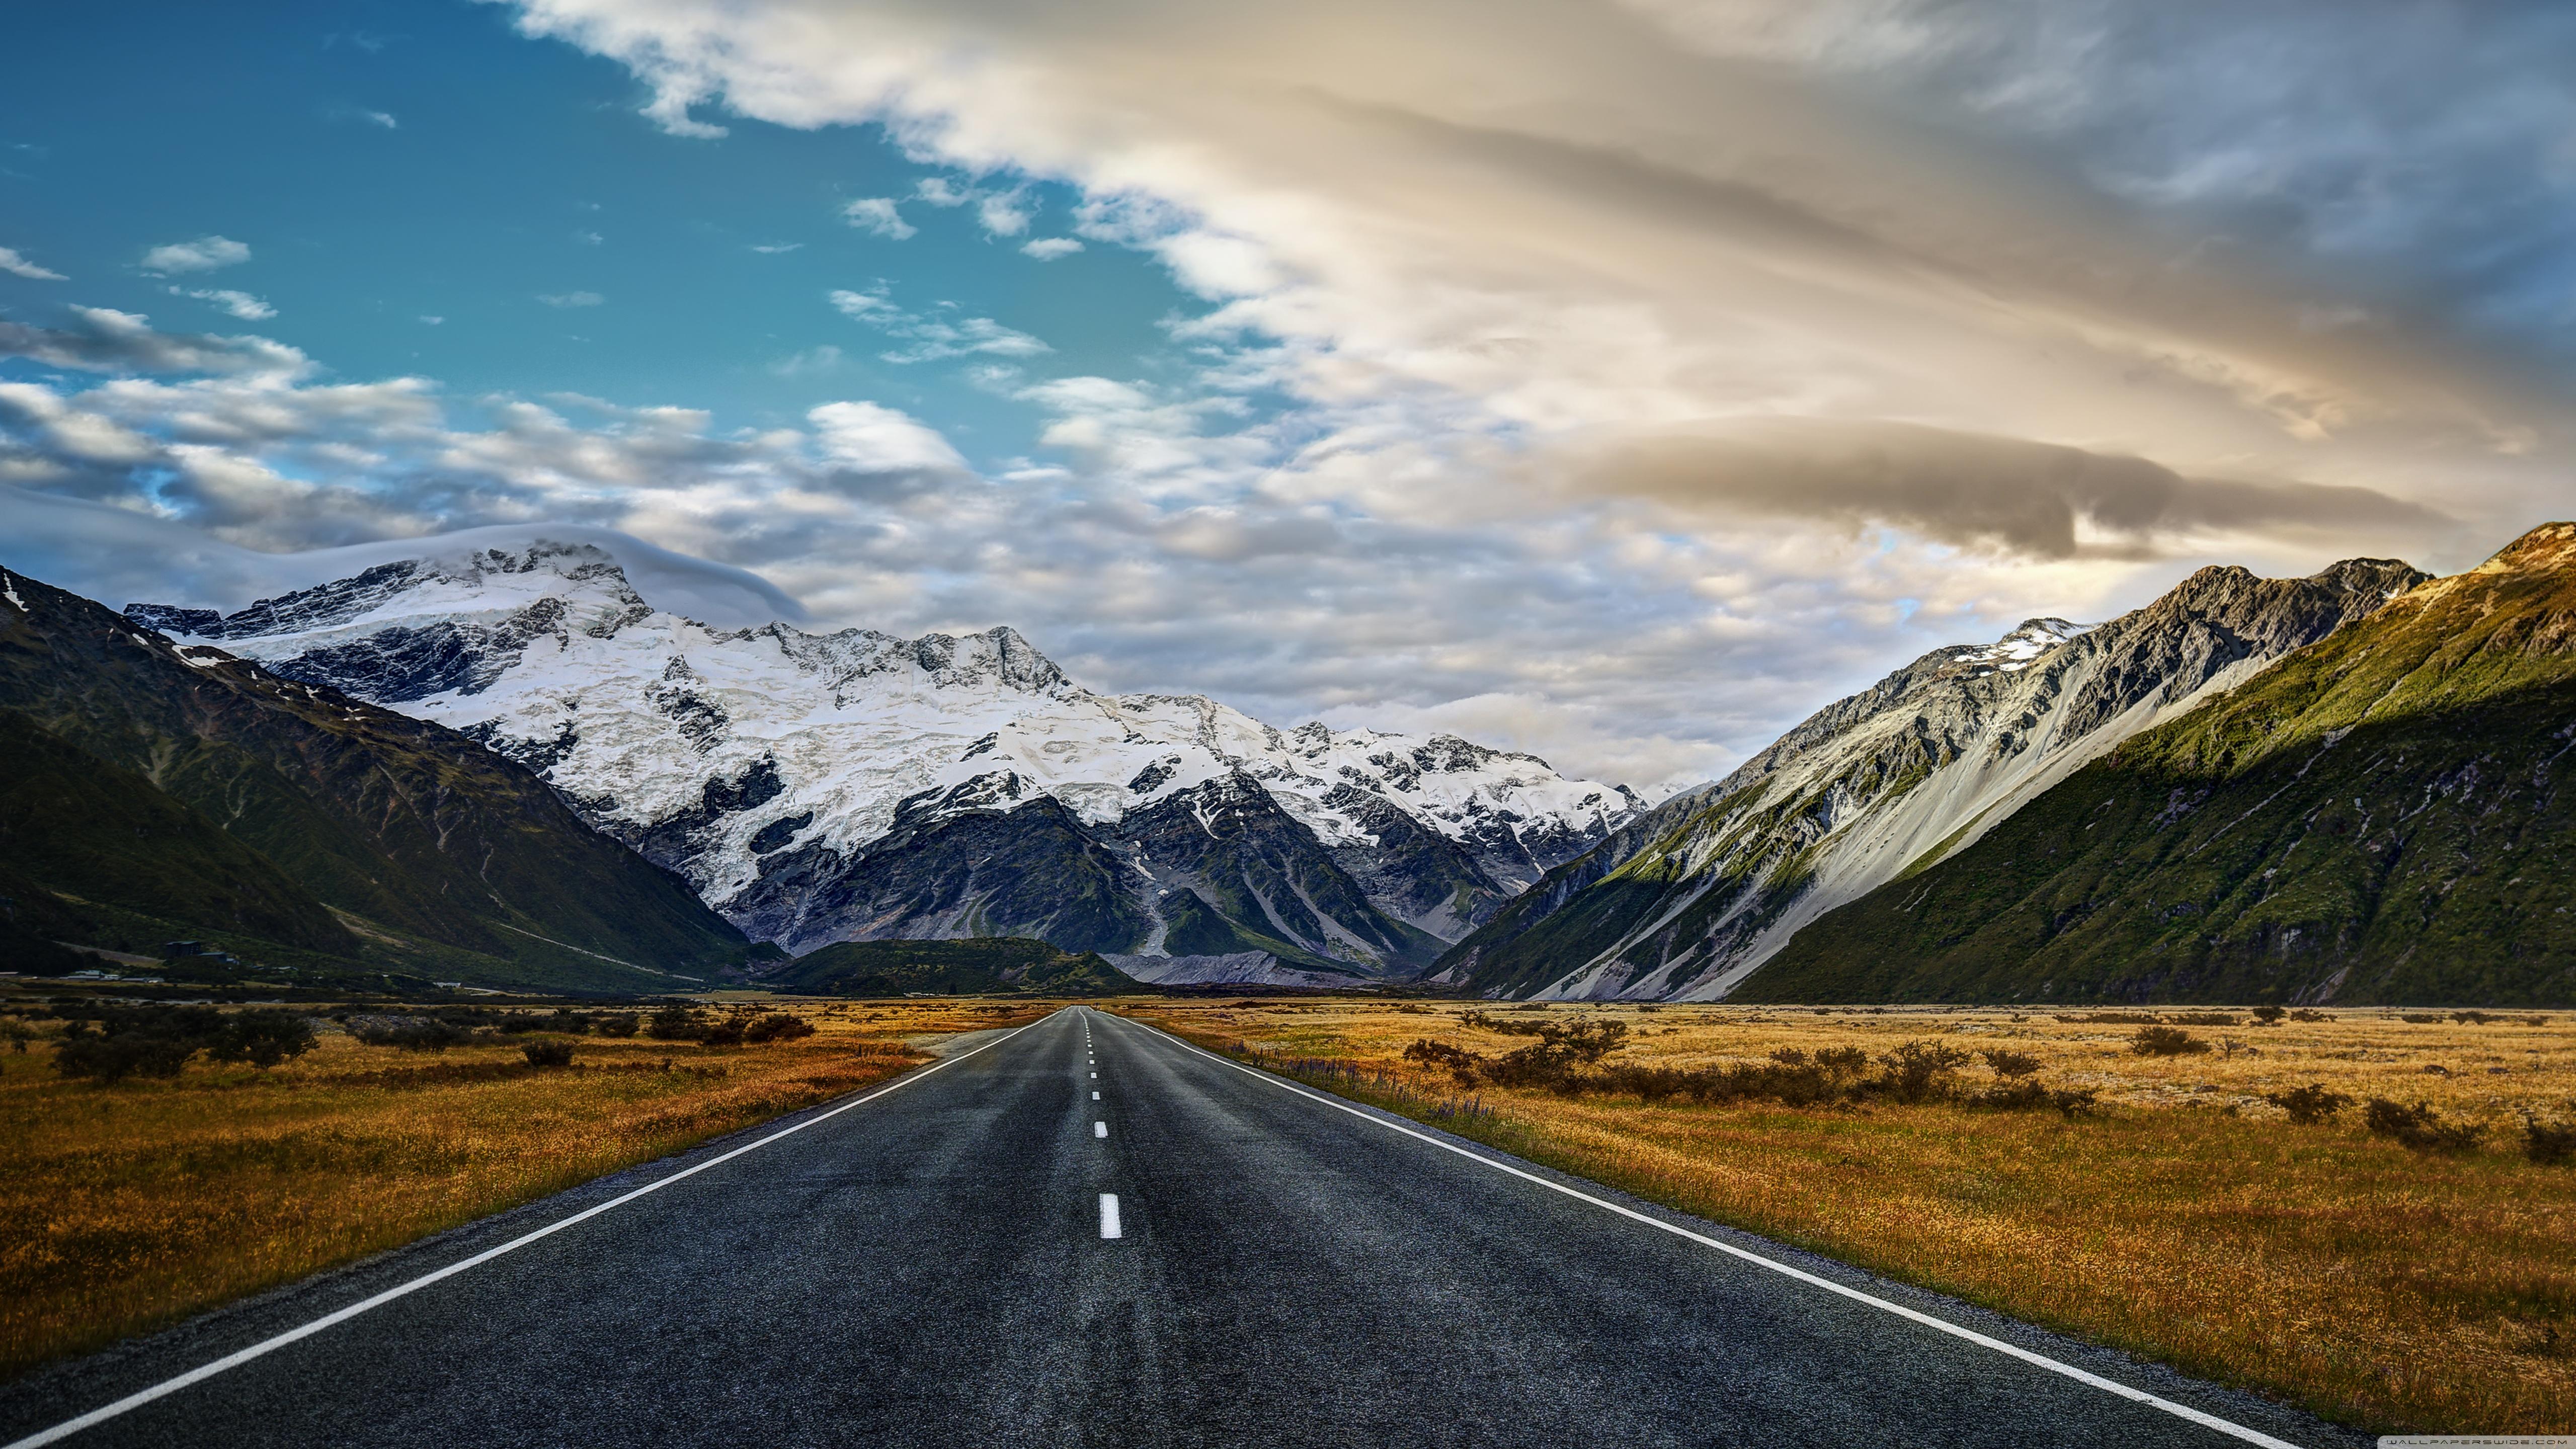 Road To Mount Cook 4K HD Desktop Wallpaper for 4K Ultra HD TV 5120x2880